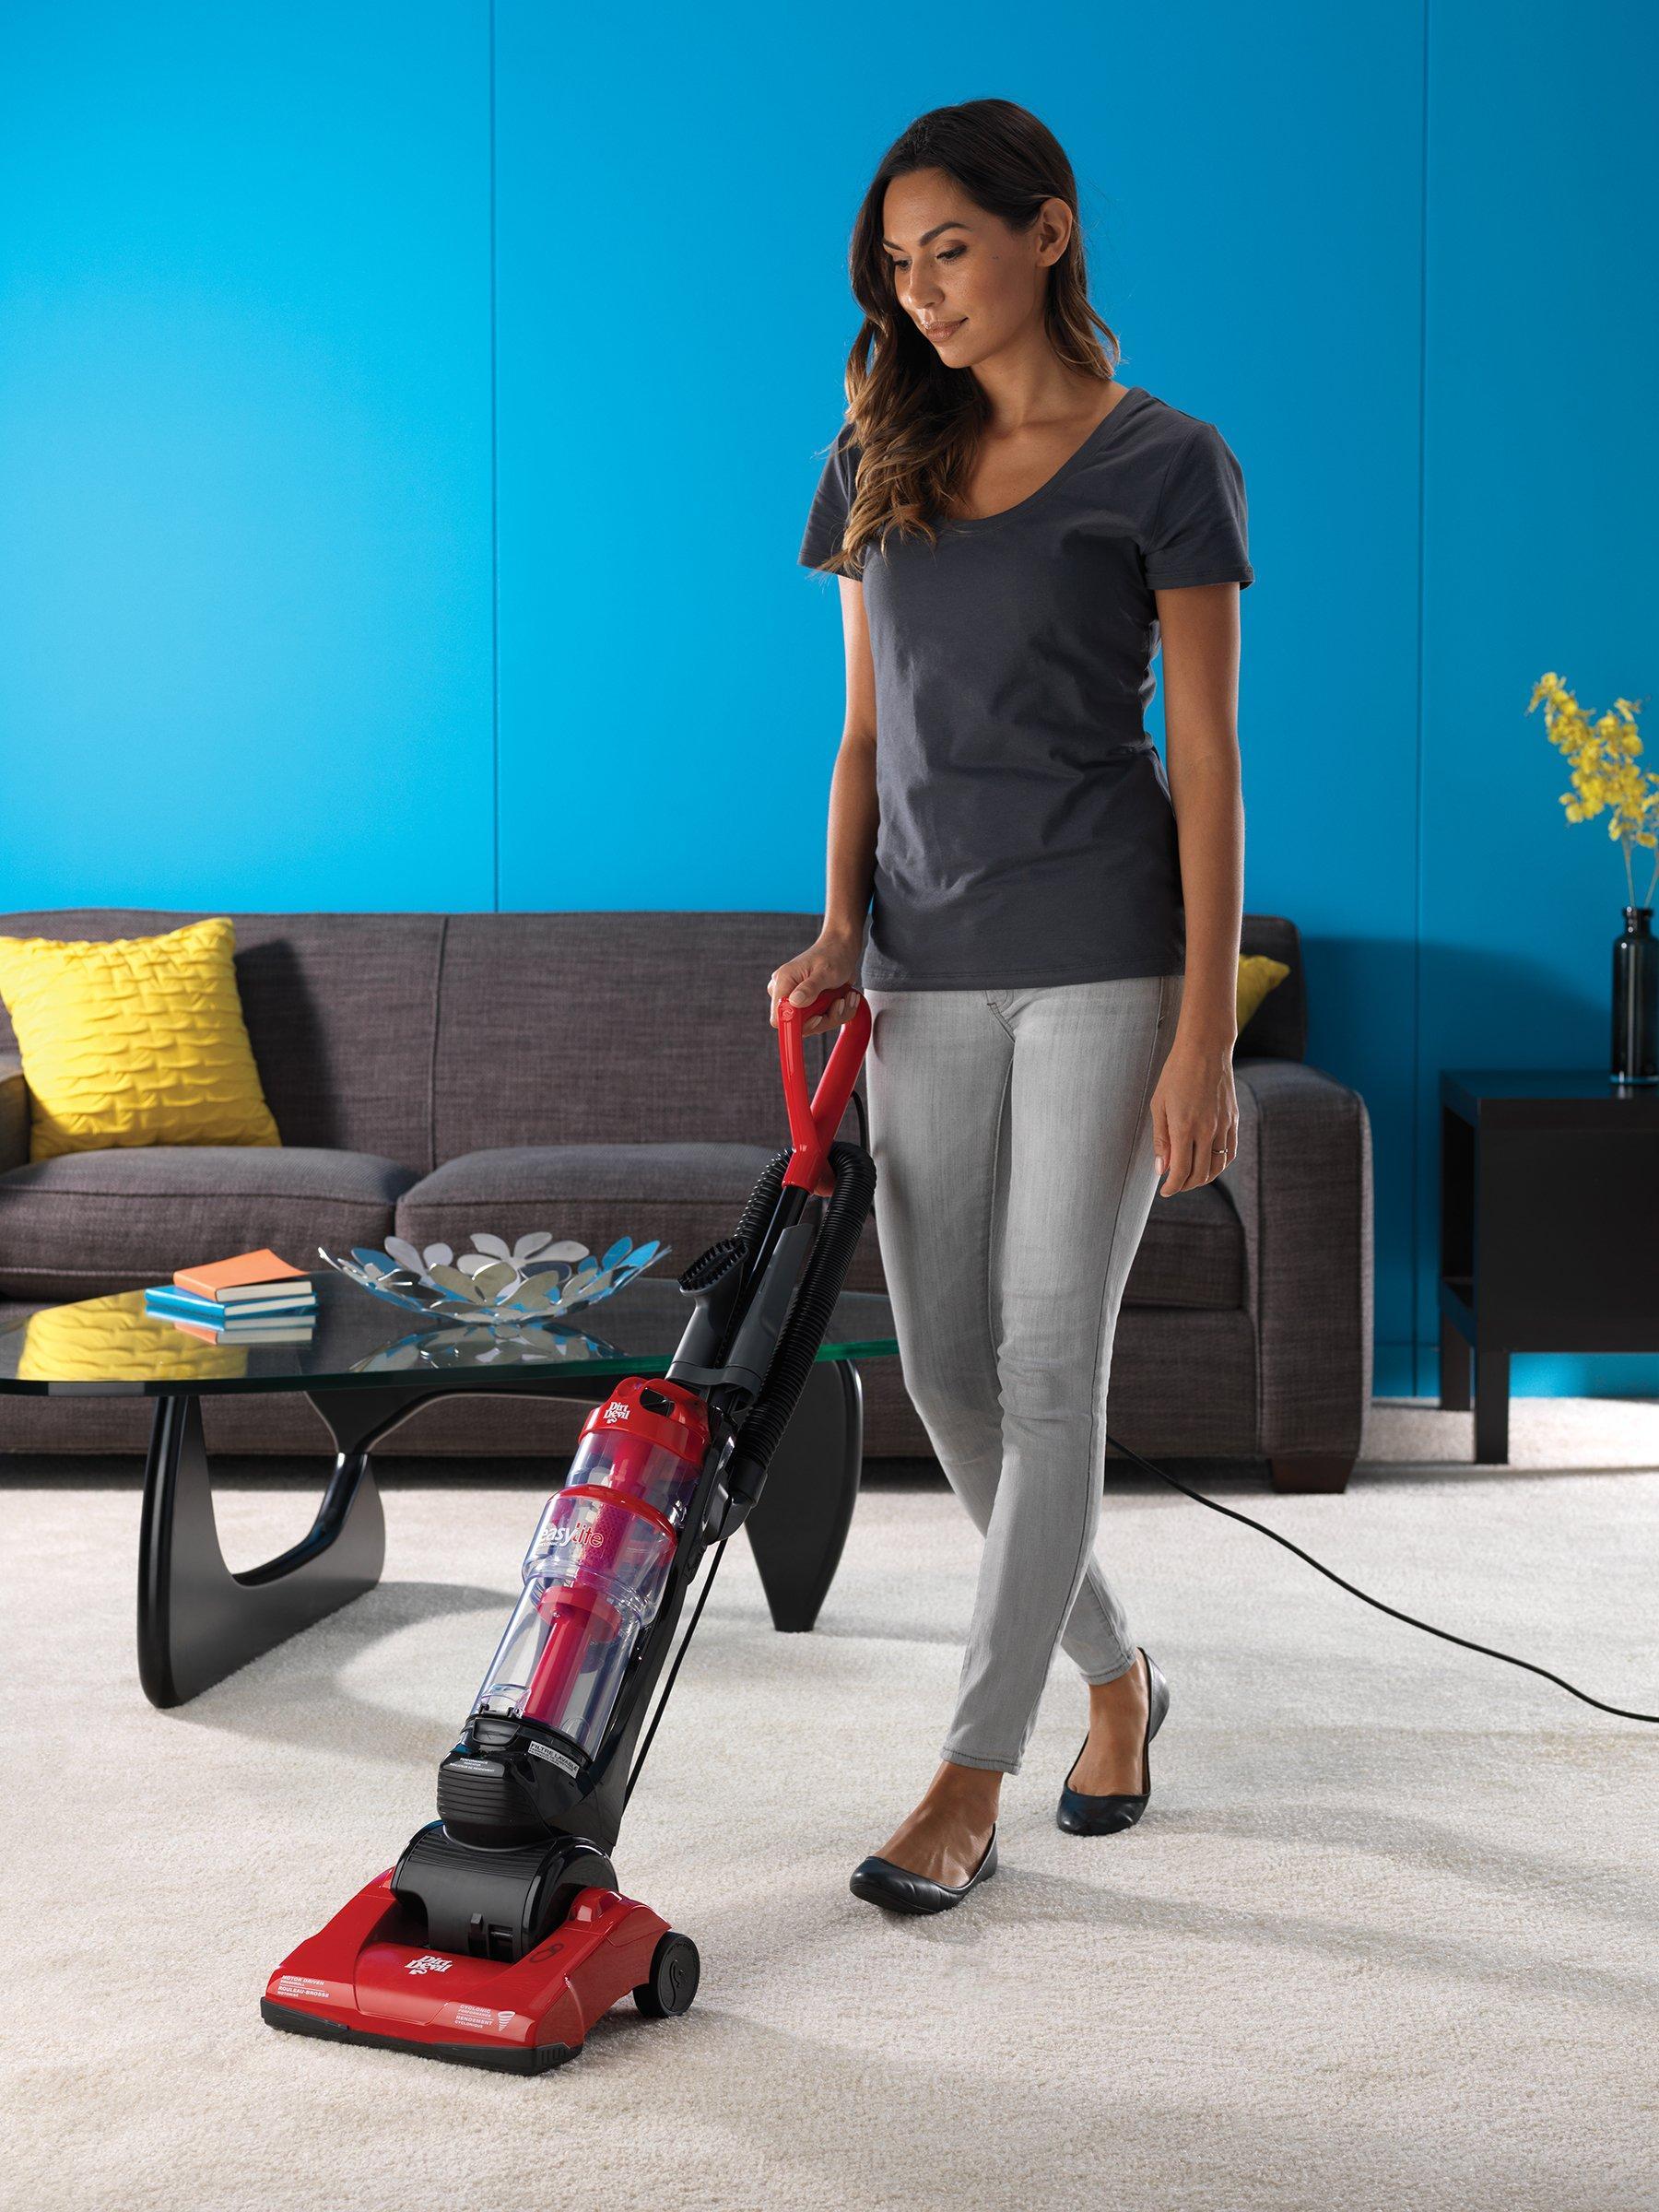 Easy Lite Cyclonic Upright Vacuum3